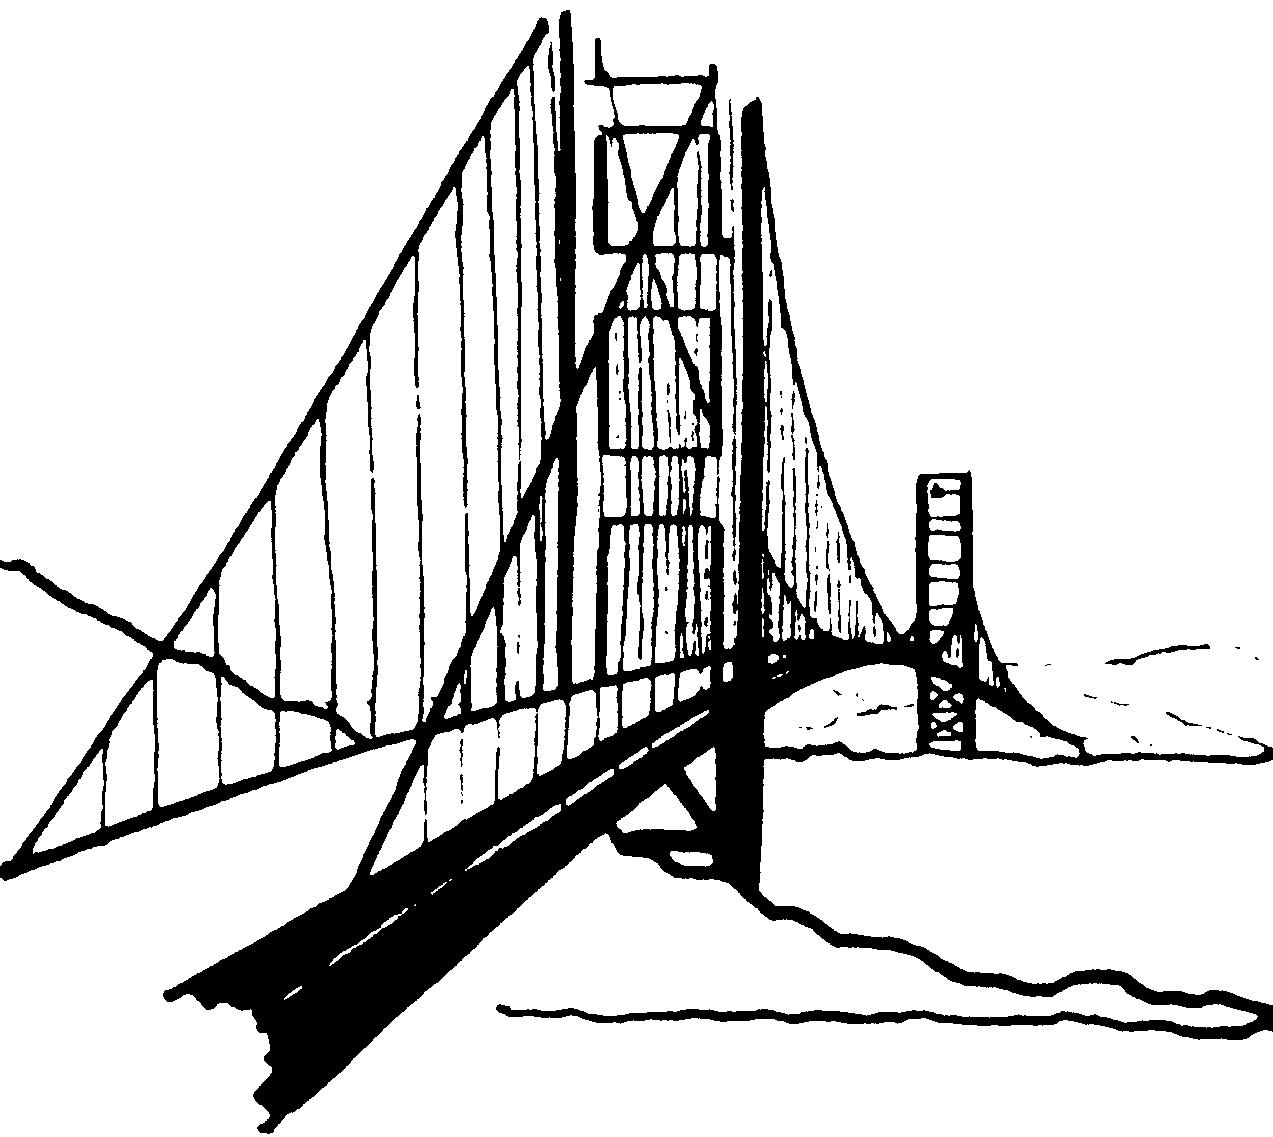 Bridge clipart line art. Free cliparts download clip